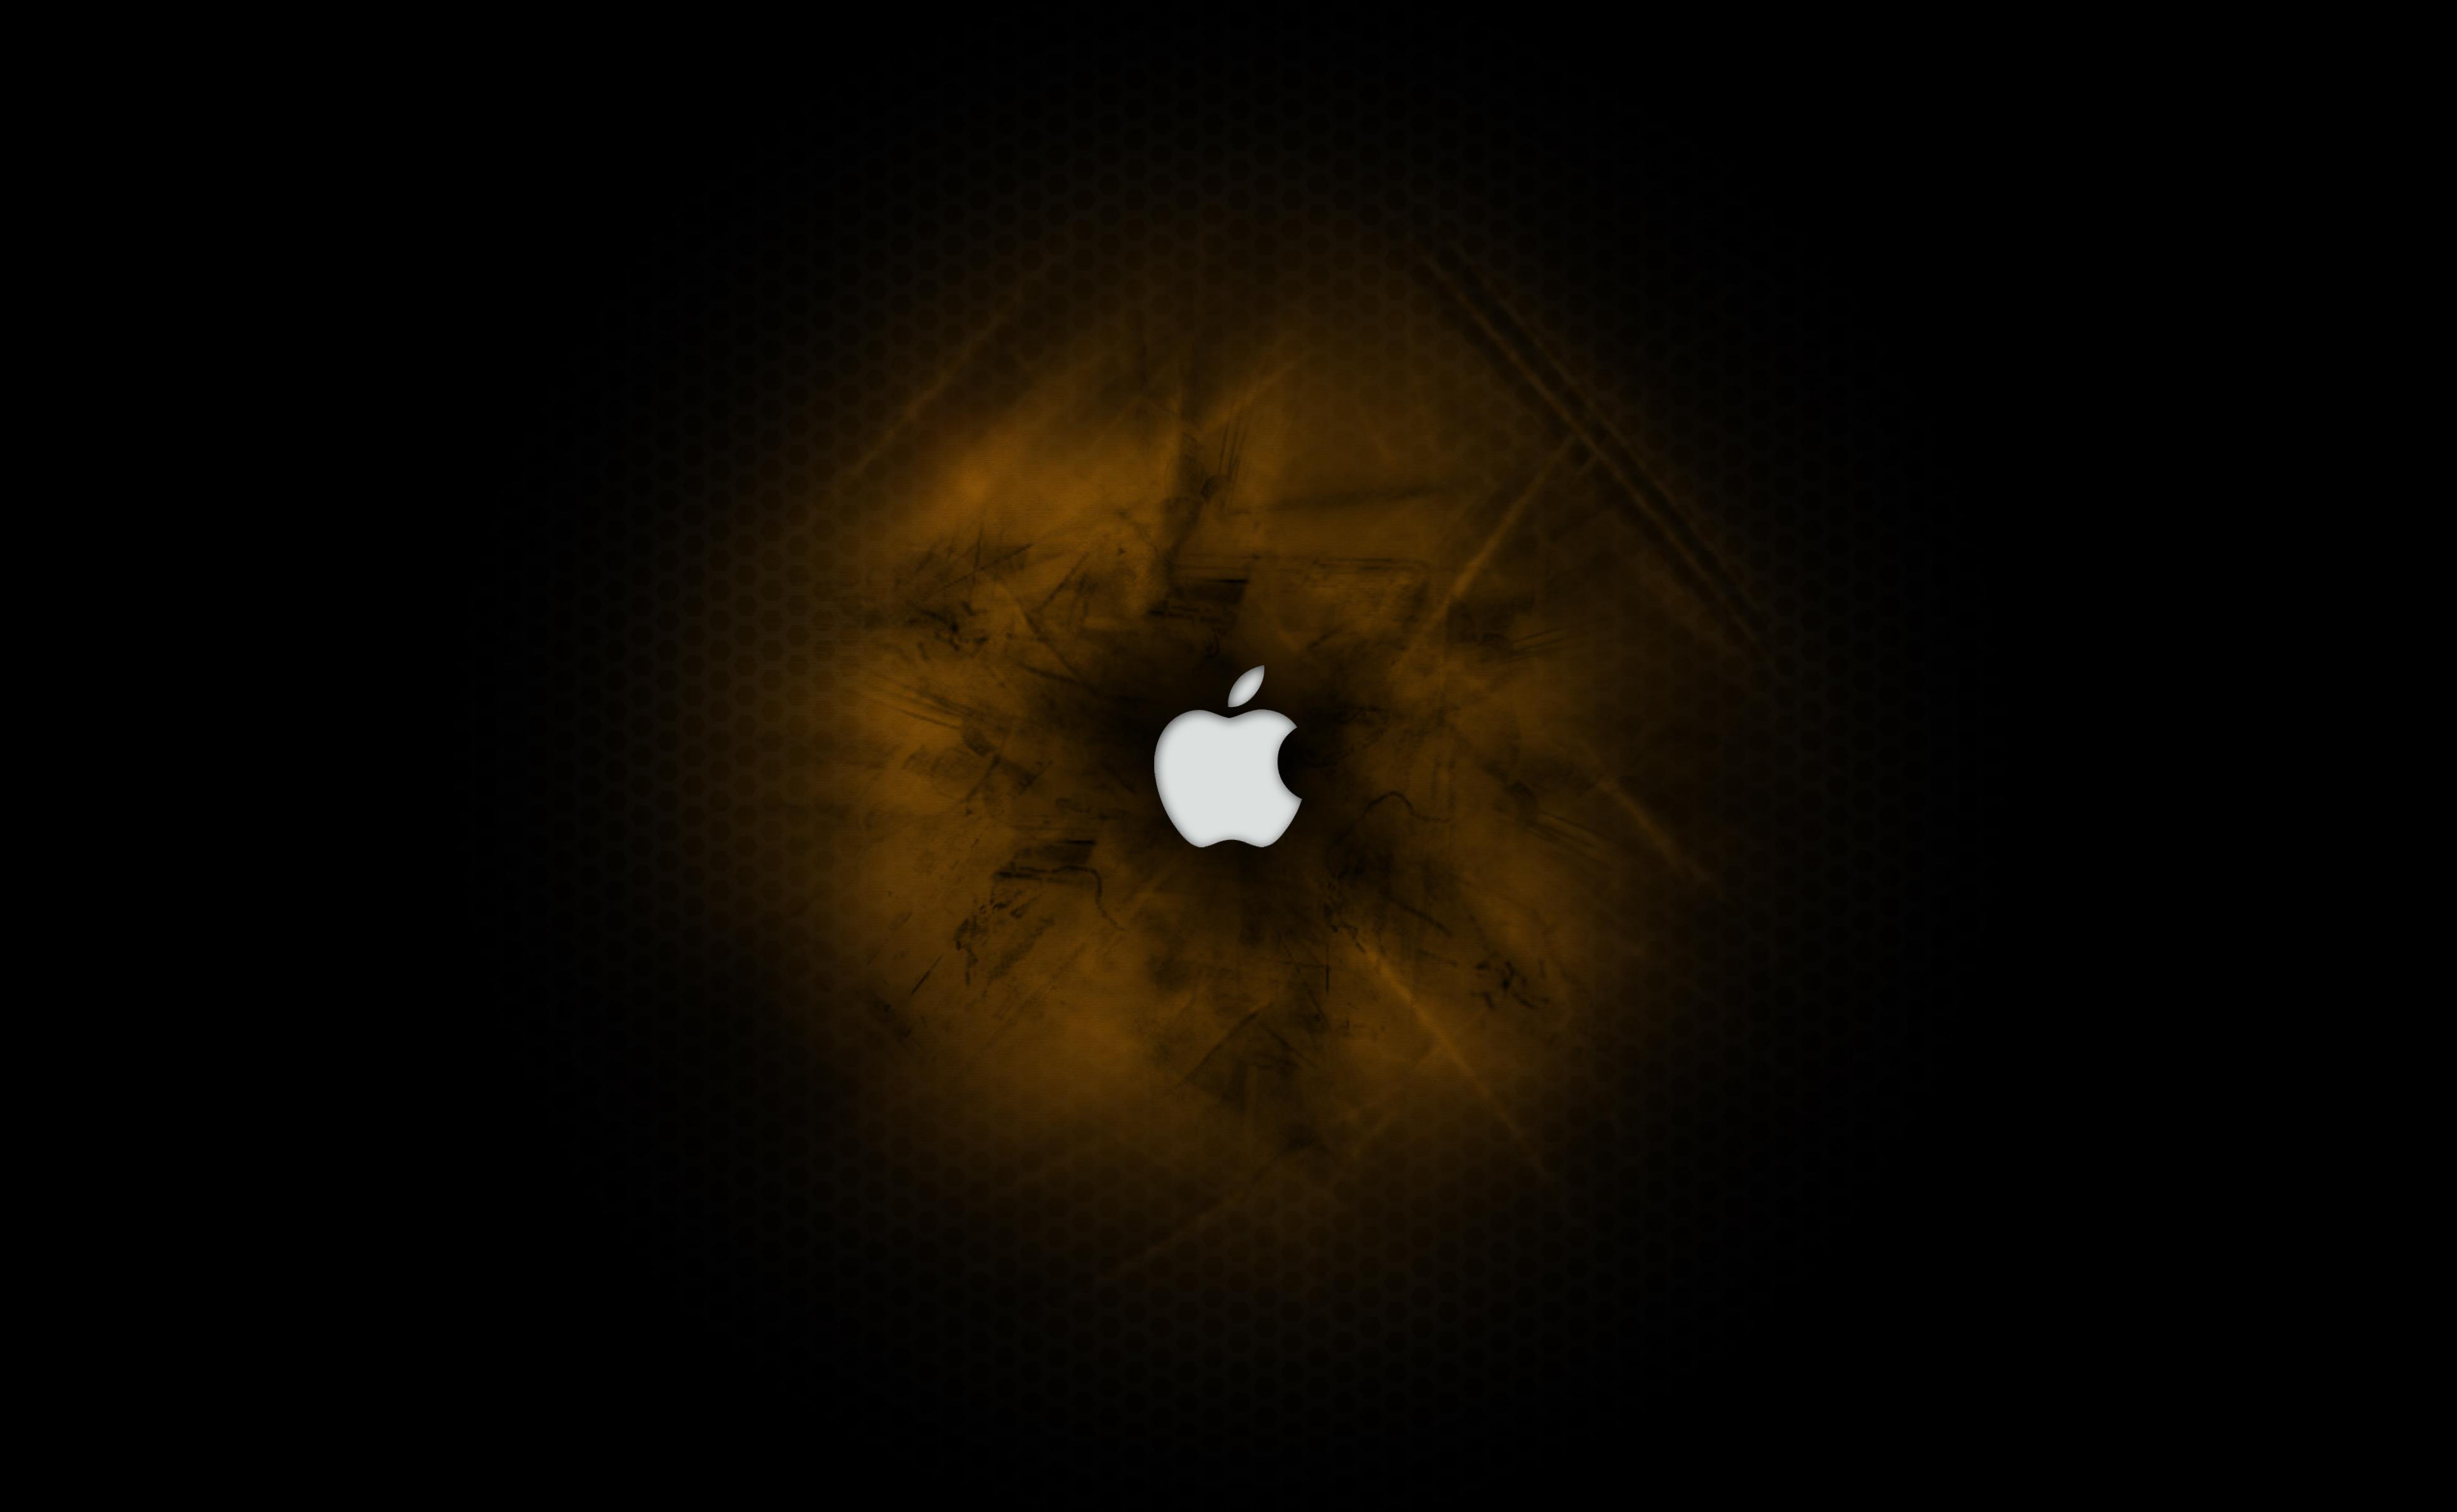 Download Staggitarius Apple Iphone 7 Hd Wallpapers: Technology äpple Apple Inc. Svart Bakgrund